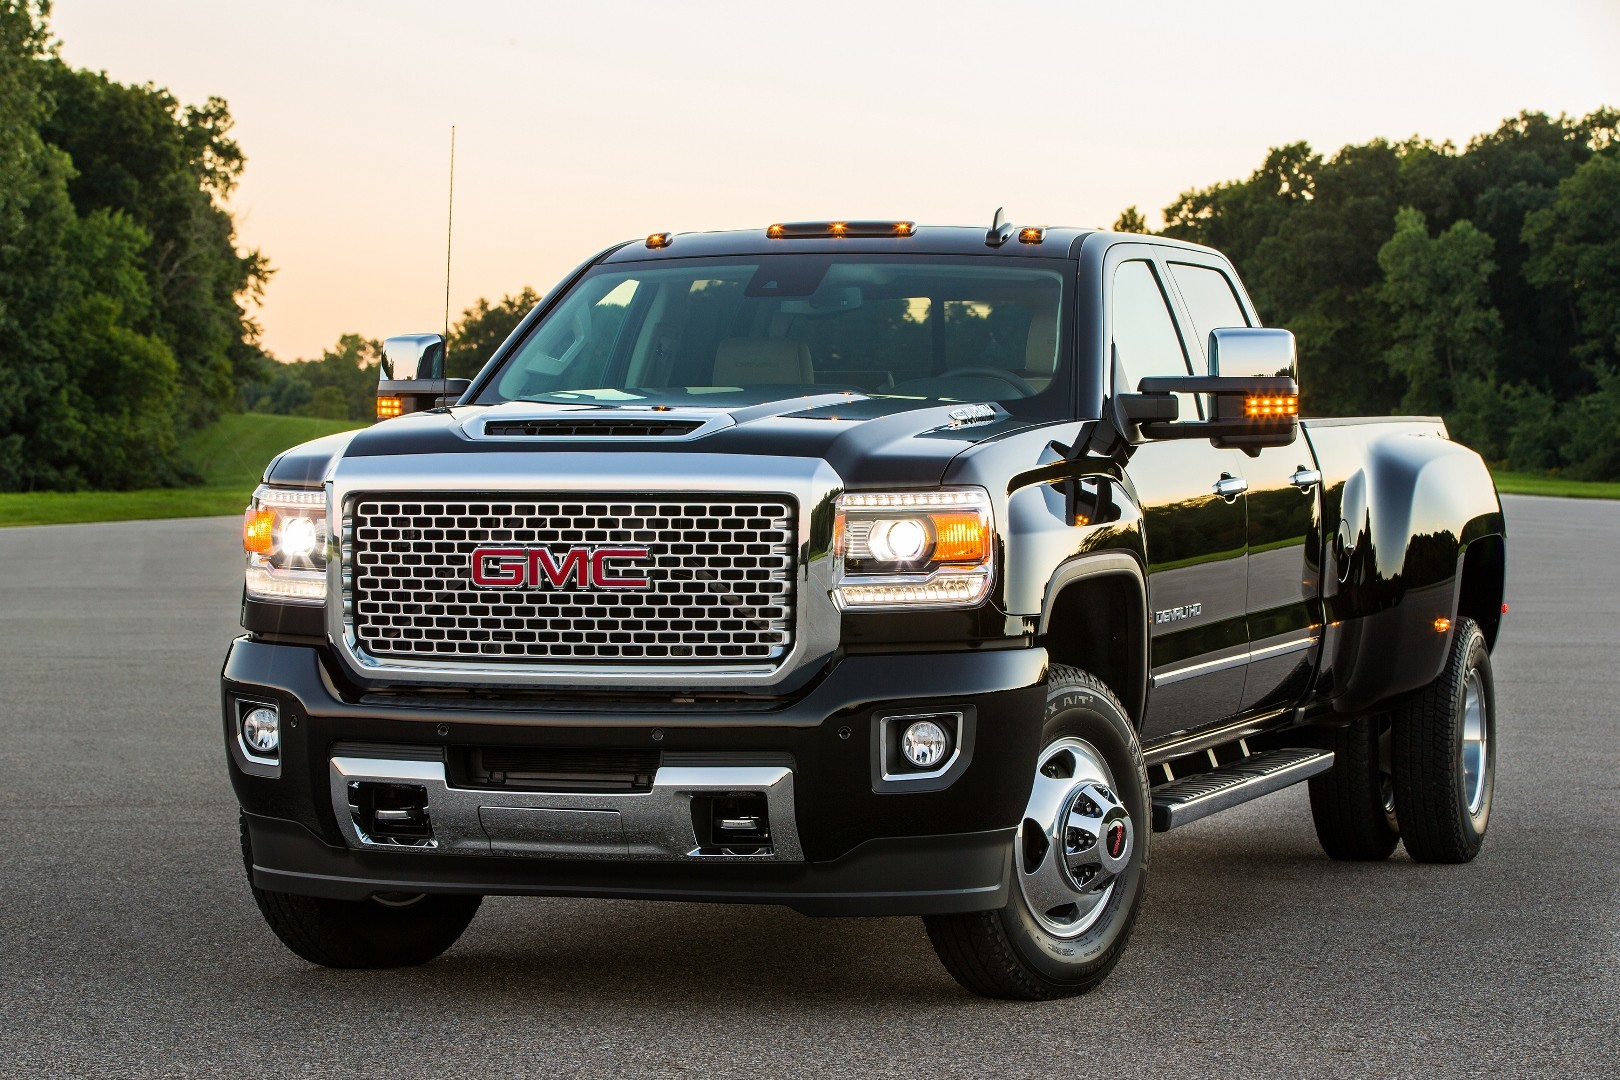 Chevrolet & GMC Silverado & Sierra Duramax Diesel 6.6 Emission Law Suit